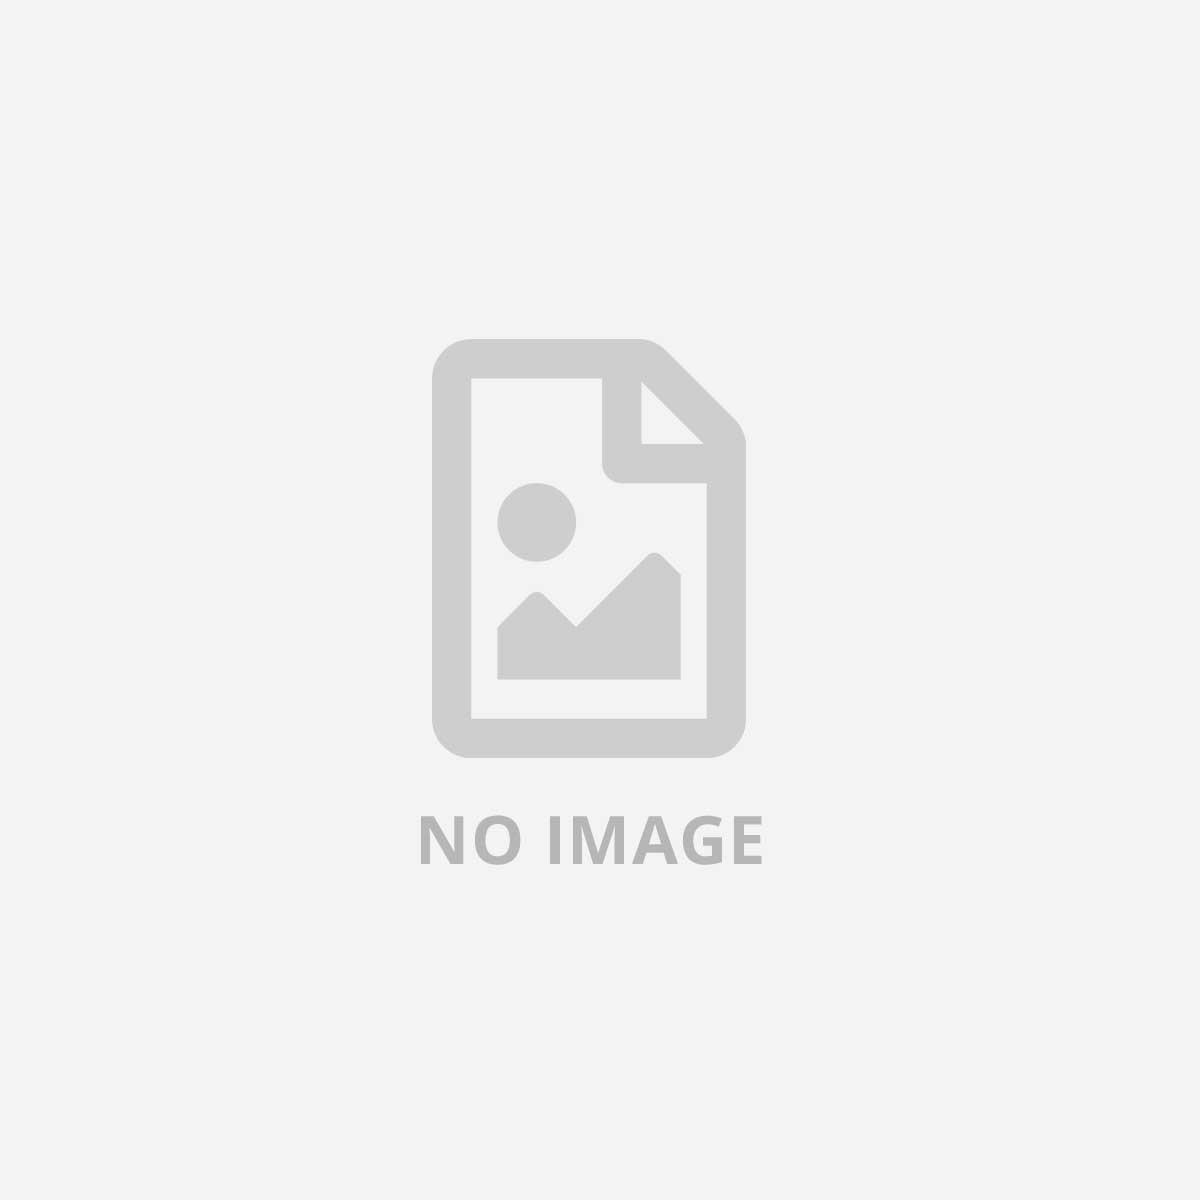 LINDY MODULO PER HDD2.5 POL SATA SAS SSD